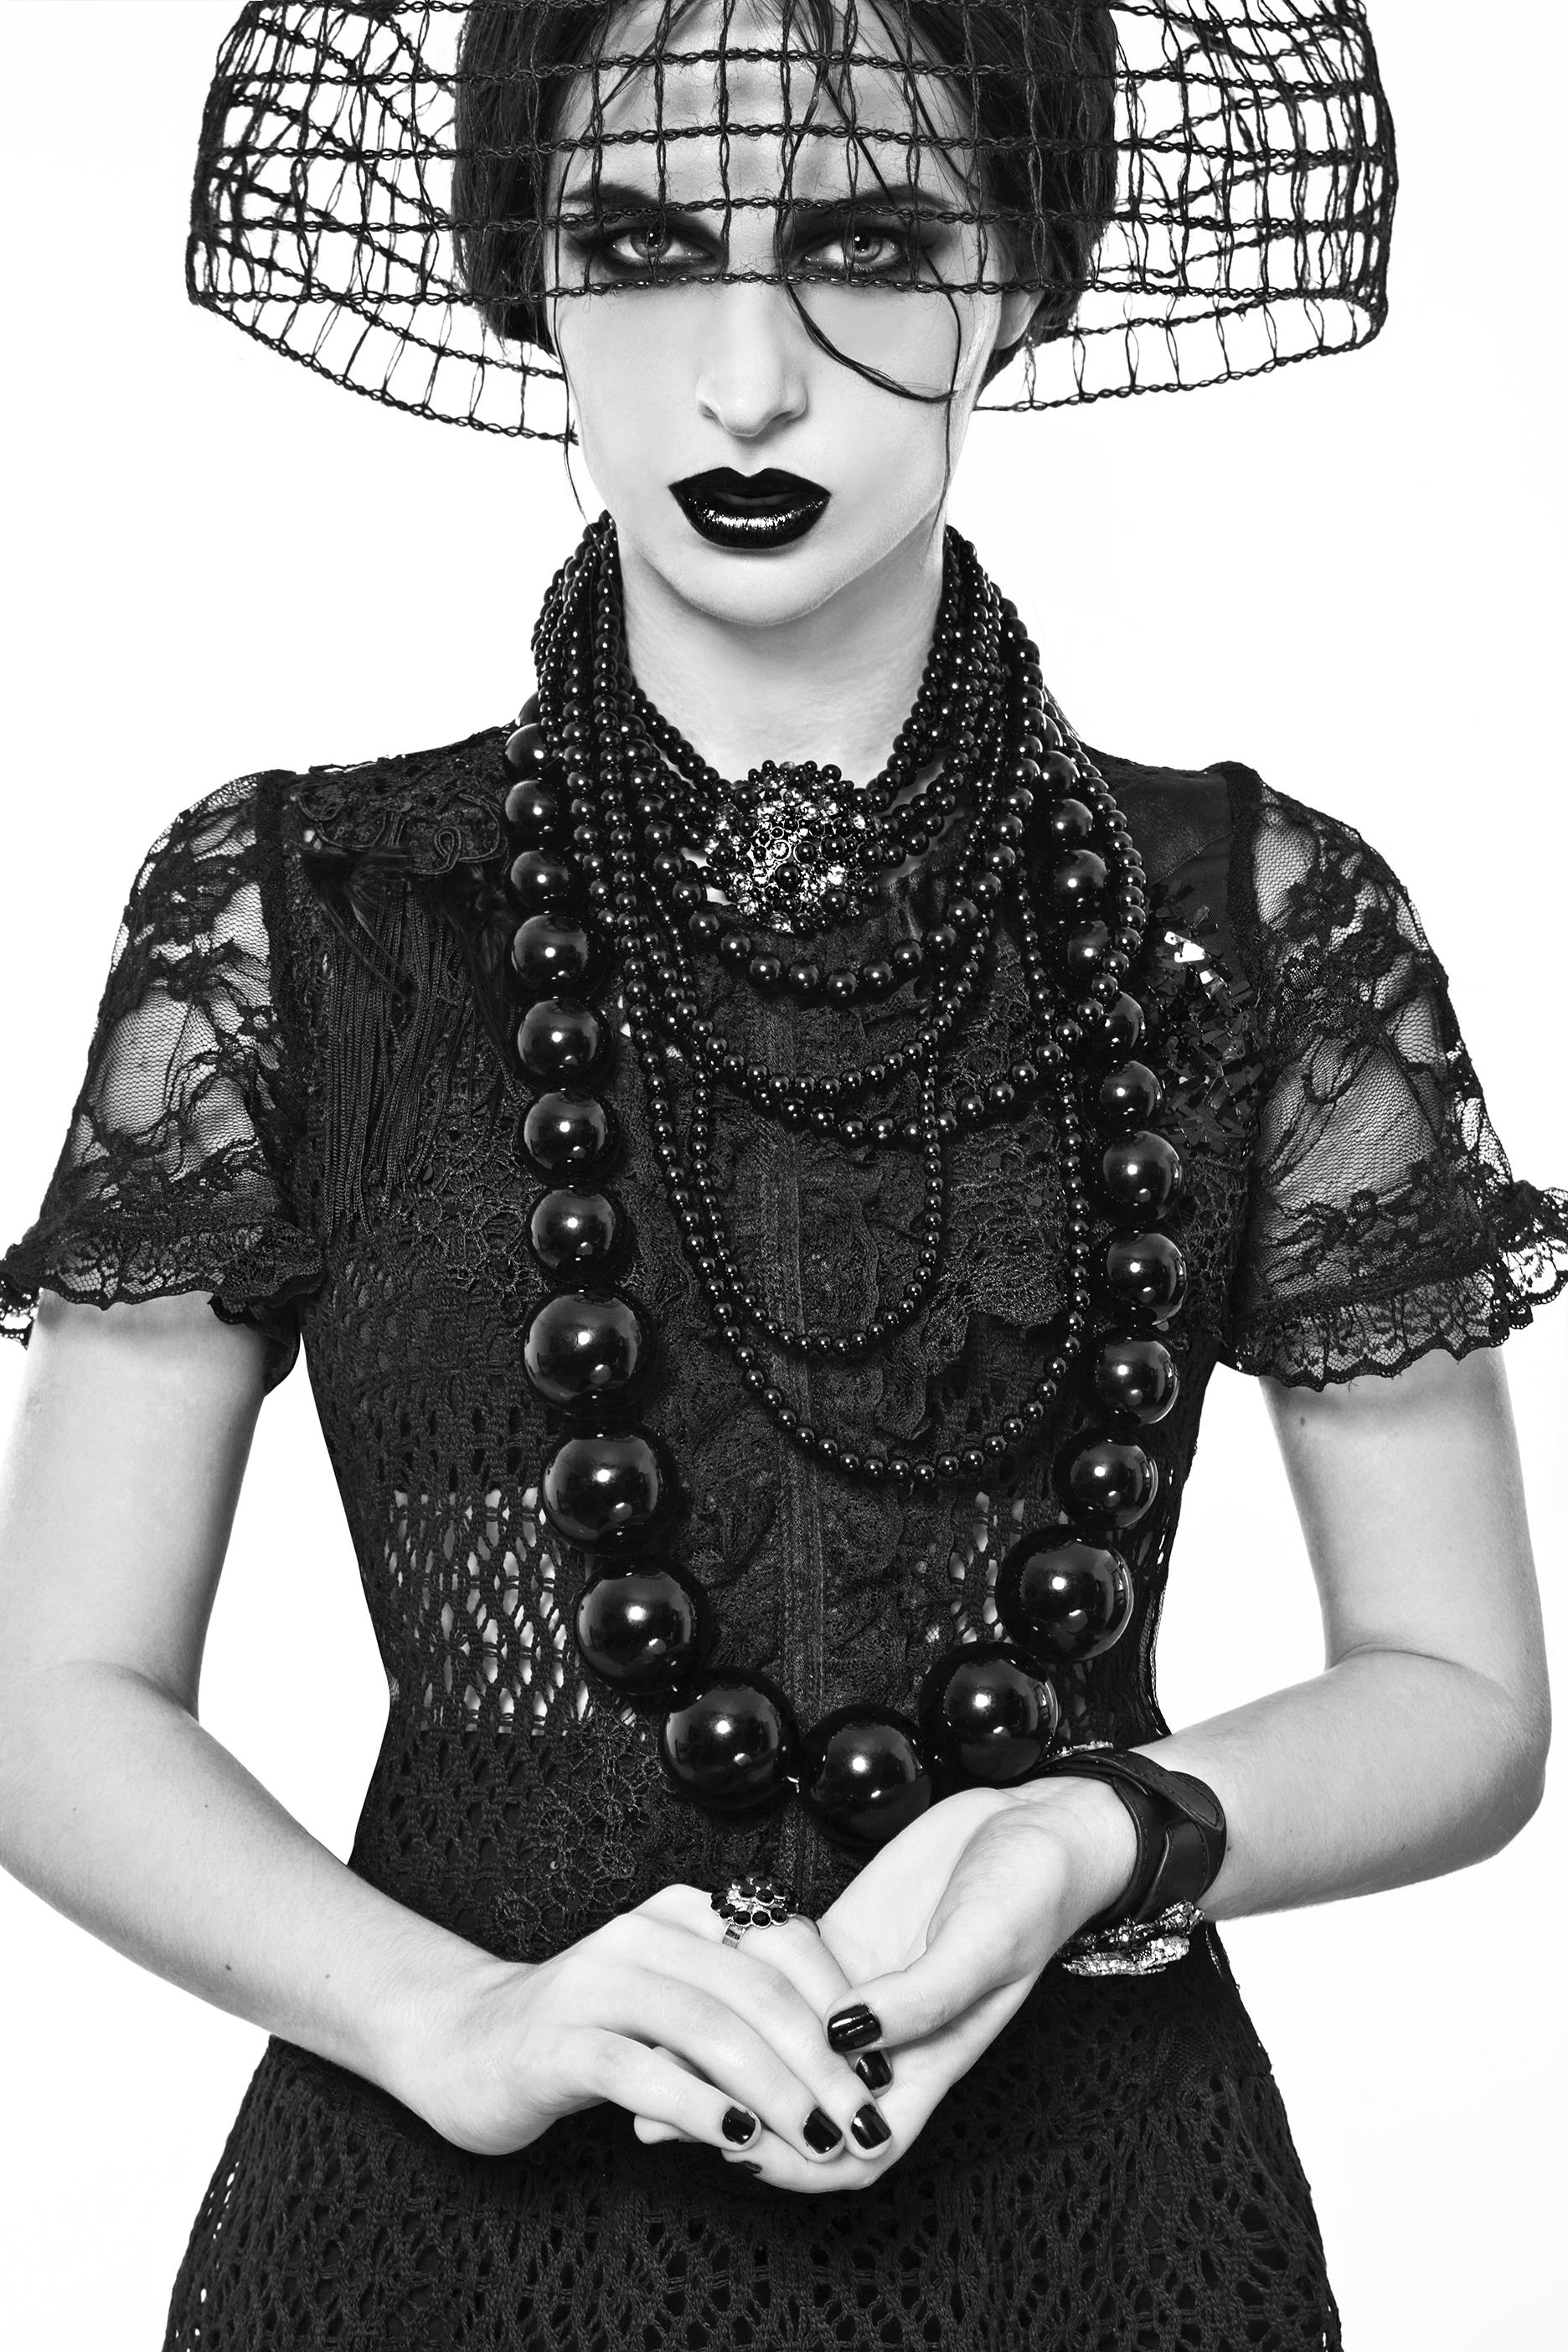 Blacklace Goth